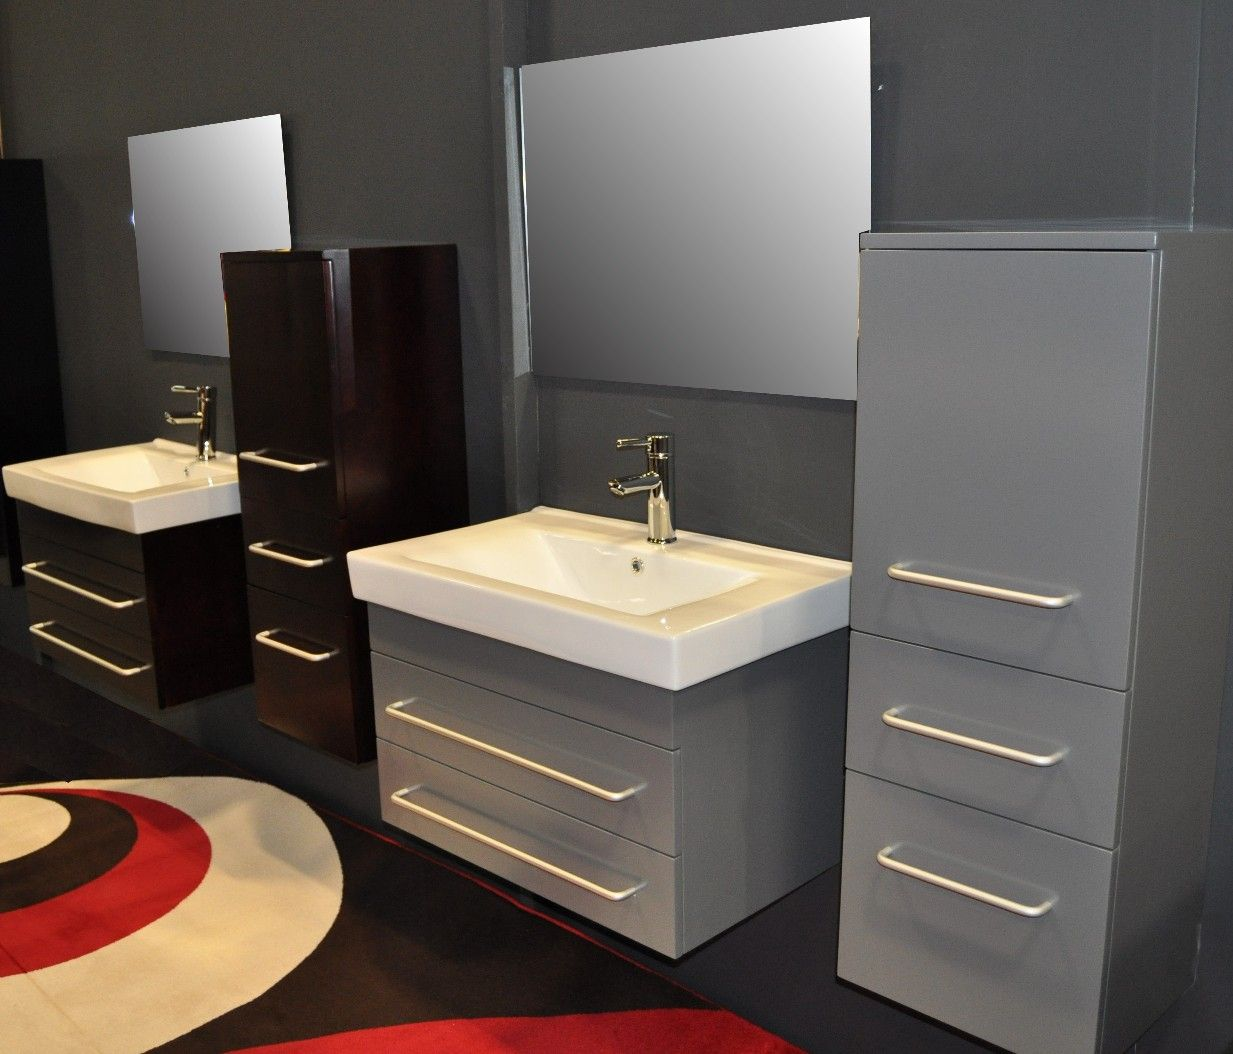 Amazing Modern Bathroom Design Ideas to Increase Home ...